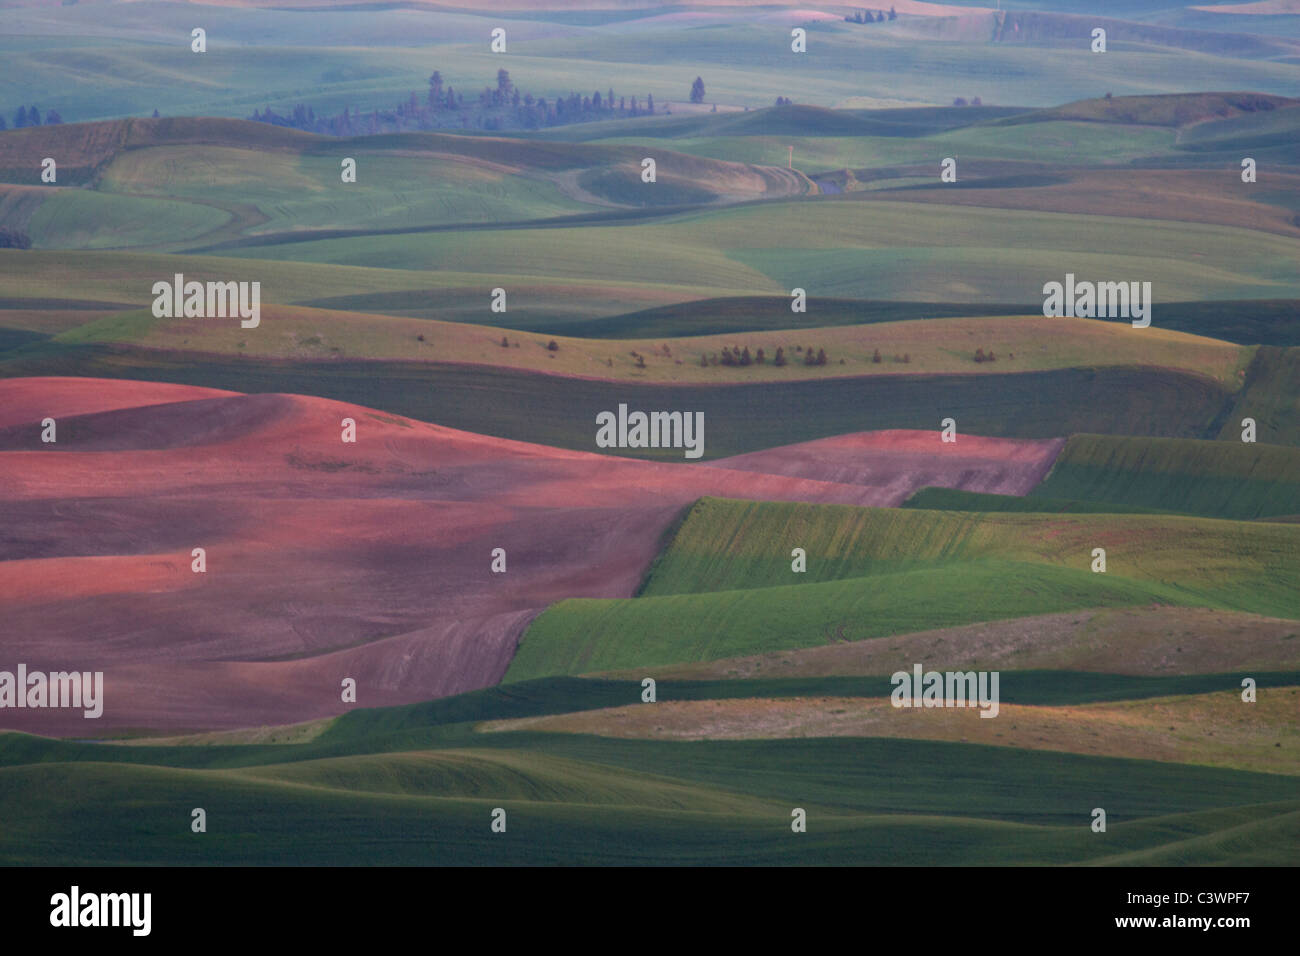 Palouse Fields Viewed From Steptoe Butte, Eastern Washington - Stock Image